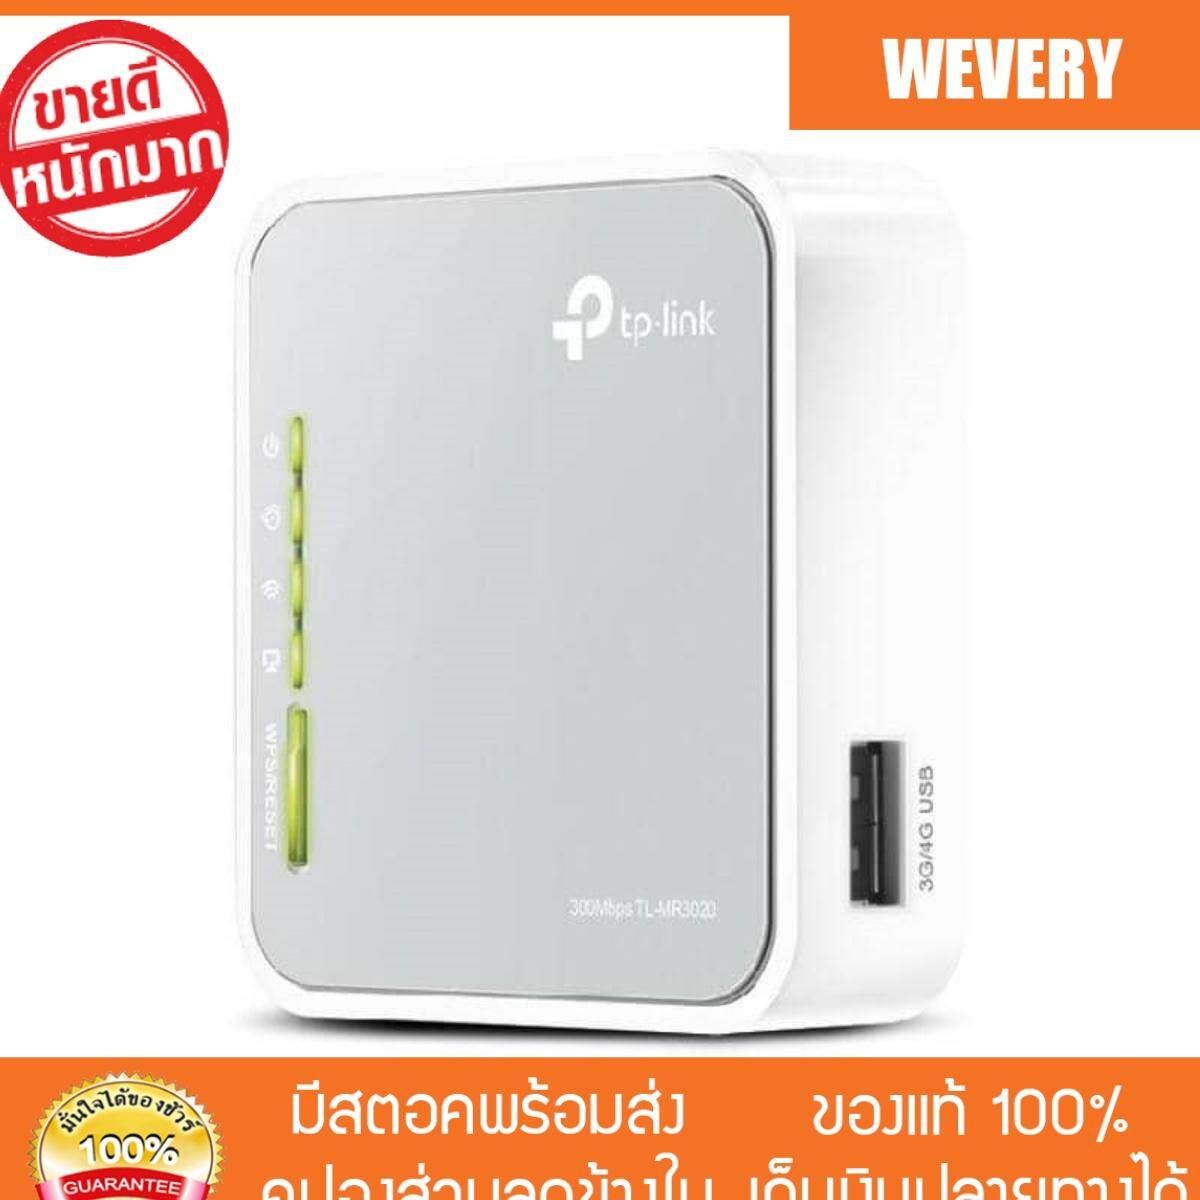 [Wevery] TP-Link TL-MR3020 (Portable 3G/4G Wireless N Router) 3G/4G Router  AP  WISP เร้าเตอร์ไวไฟ ส่ง Kerry เก็บปลายทางได้